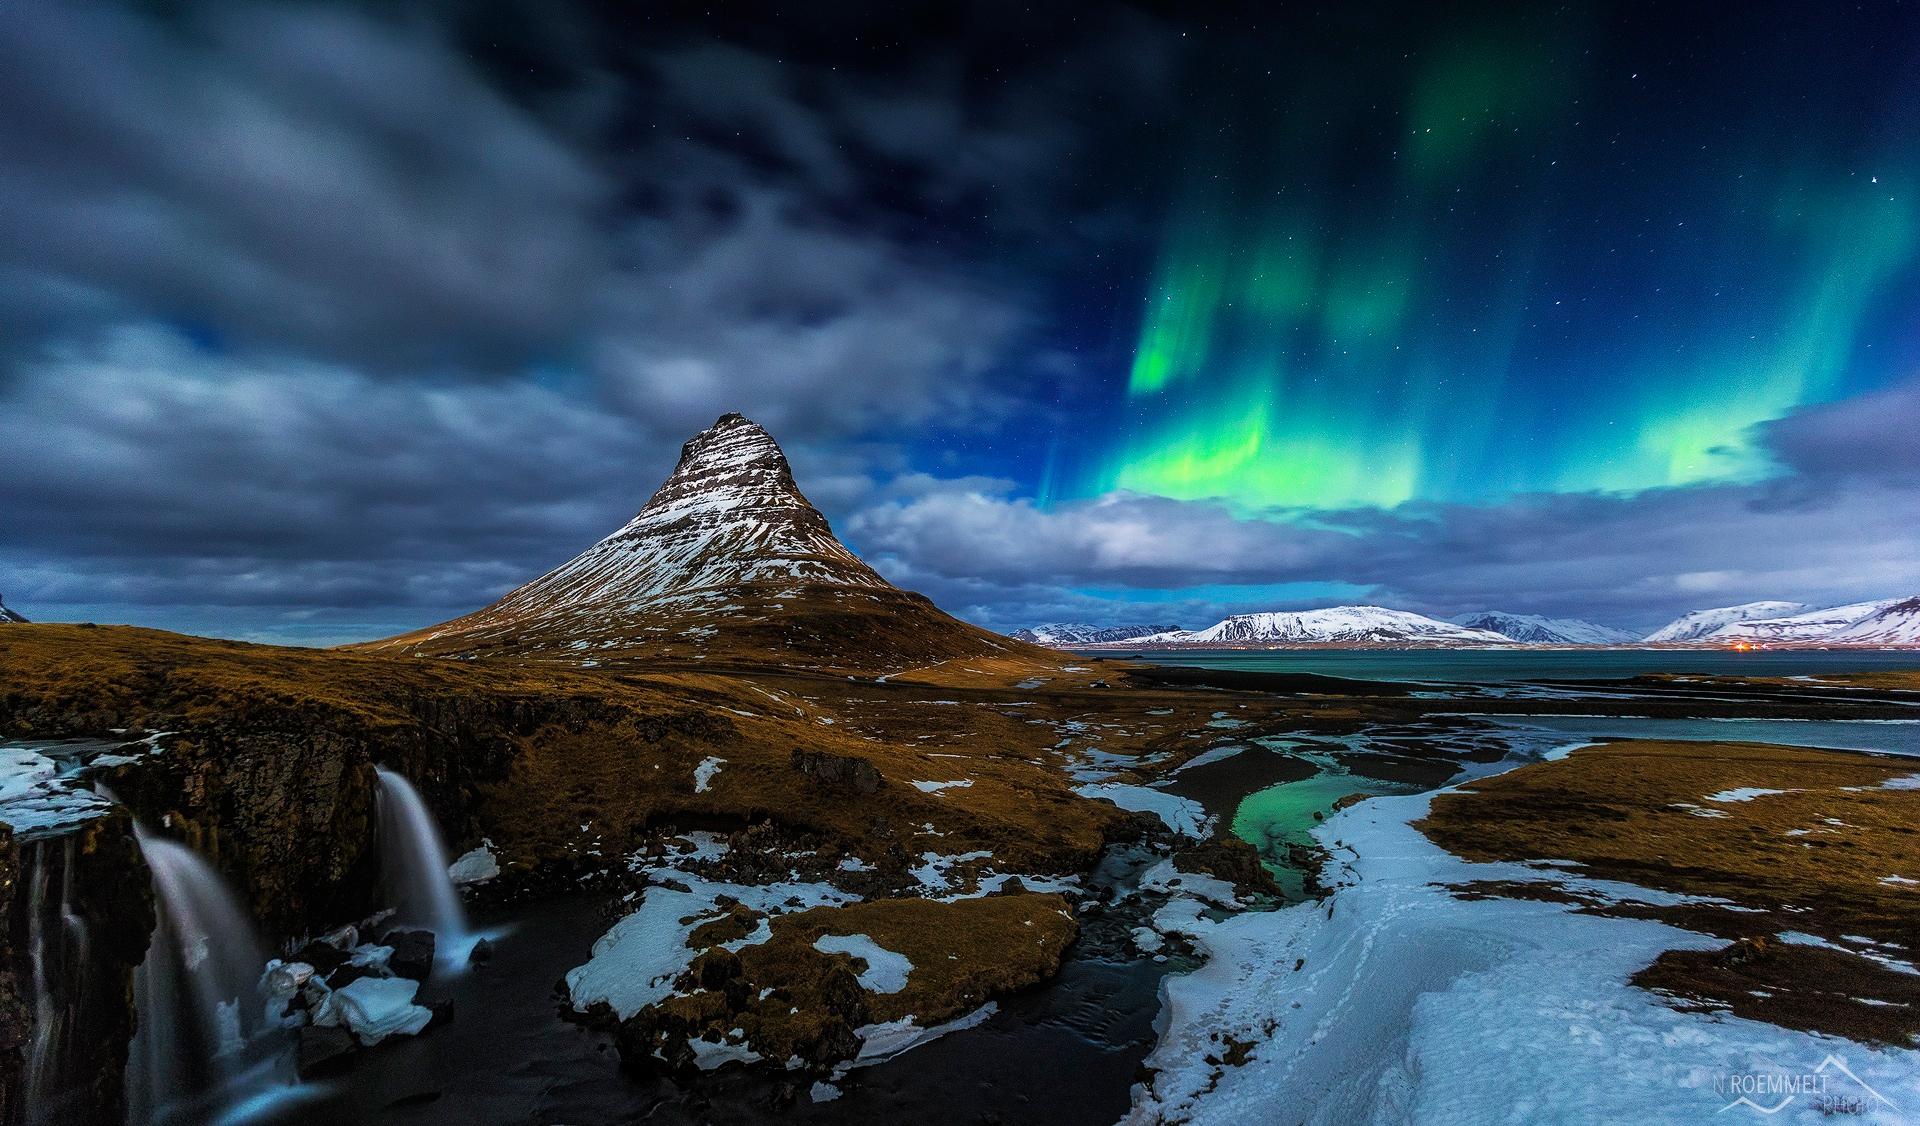 обои на рабочий исландия счета